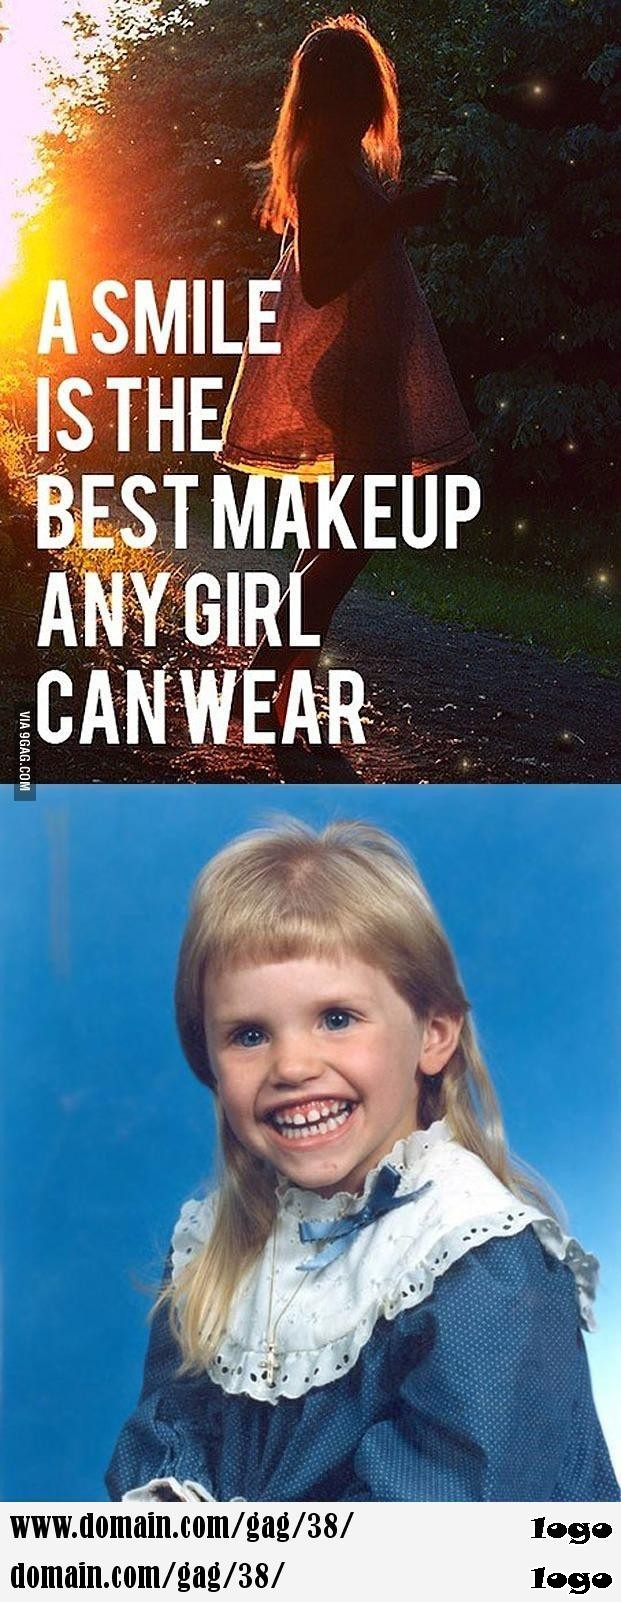 That evil smile